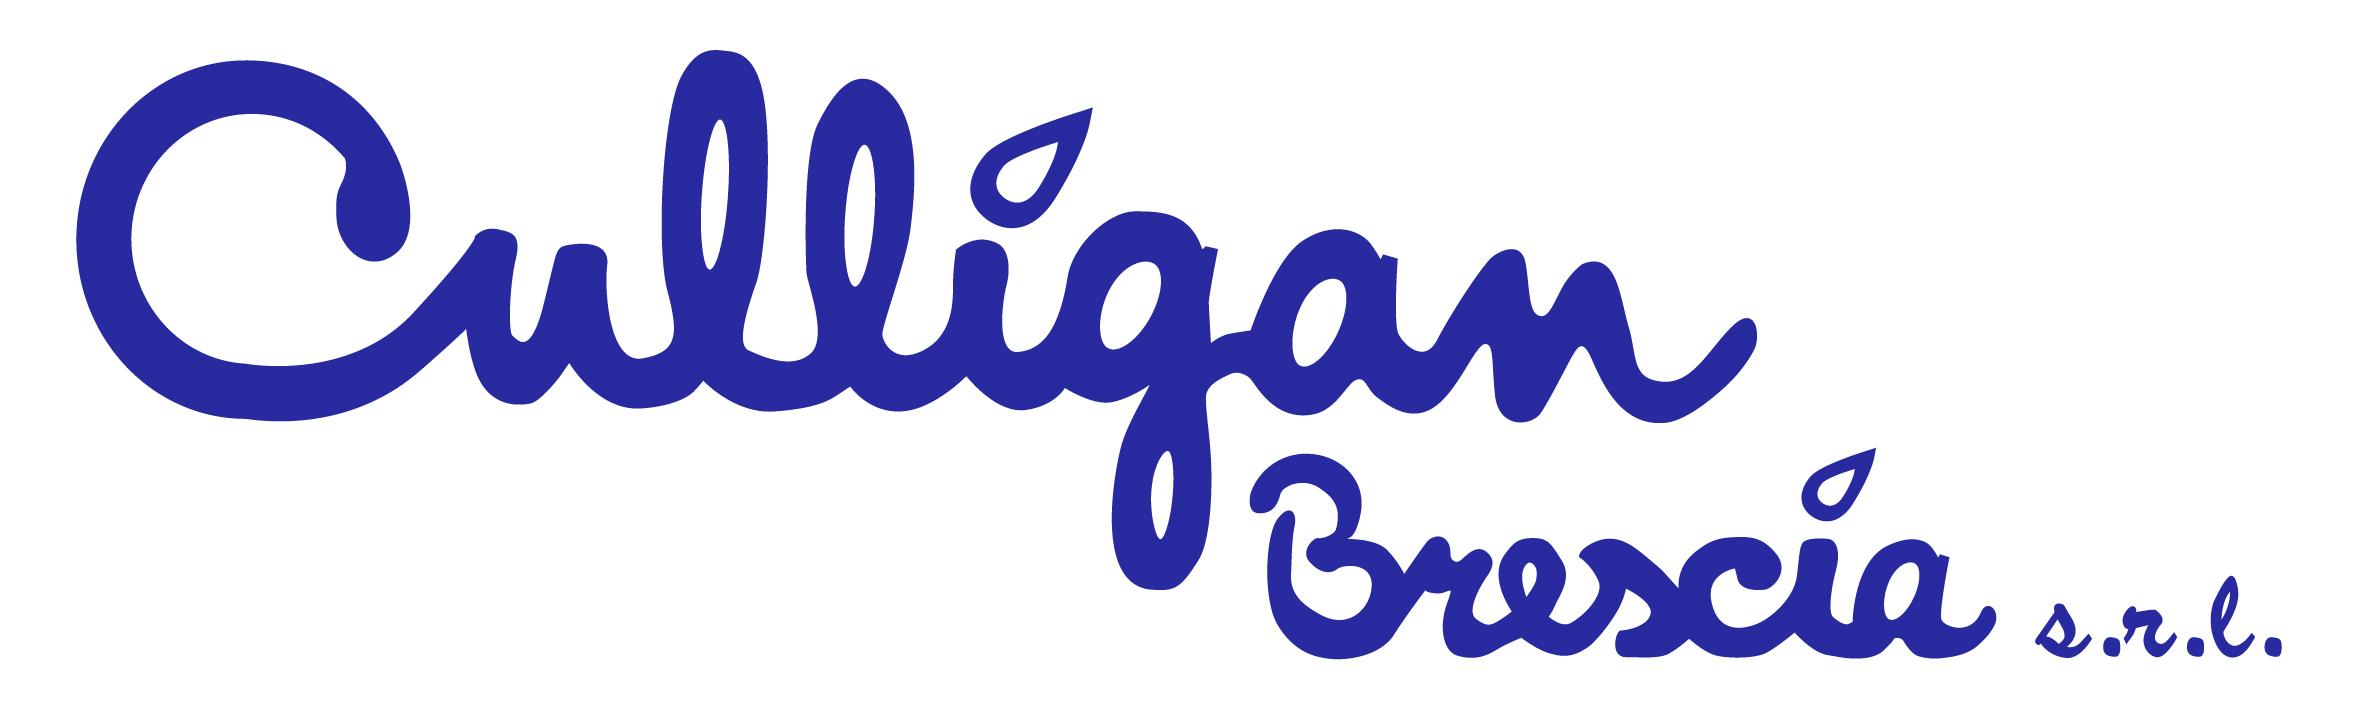 logo_culligan_brescia